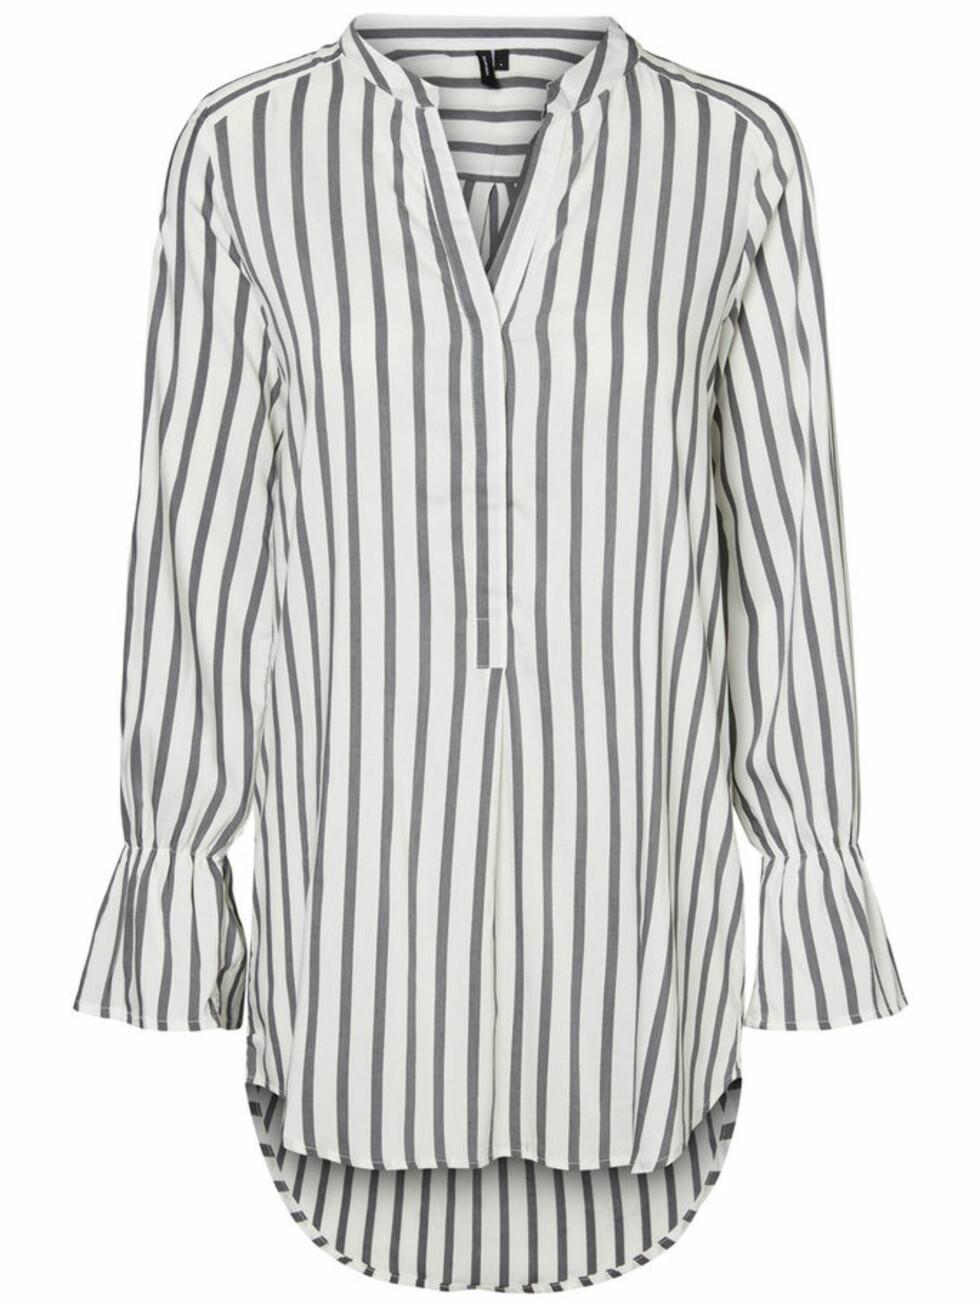 Skjorte fra Vero Moda |380,-| https://www.veromoda.com/no/no/vm/handla-efter-kategori/skjorter/lang-skjorte-10191774.html?cgid=vm-shirts&dwvar_colorPattern=10191774_SnowWhite_605399